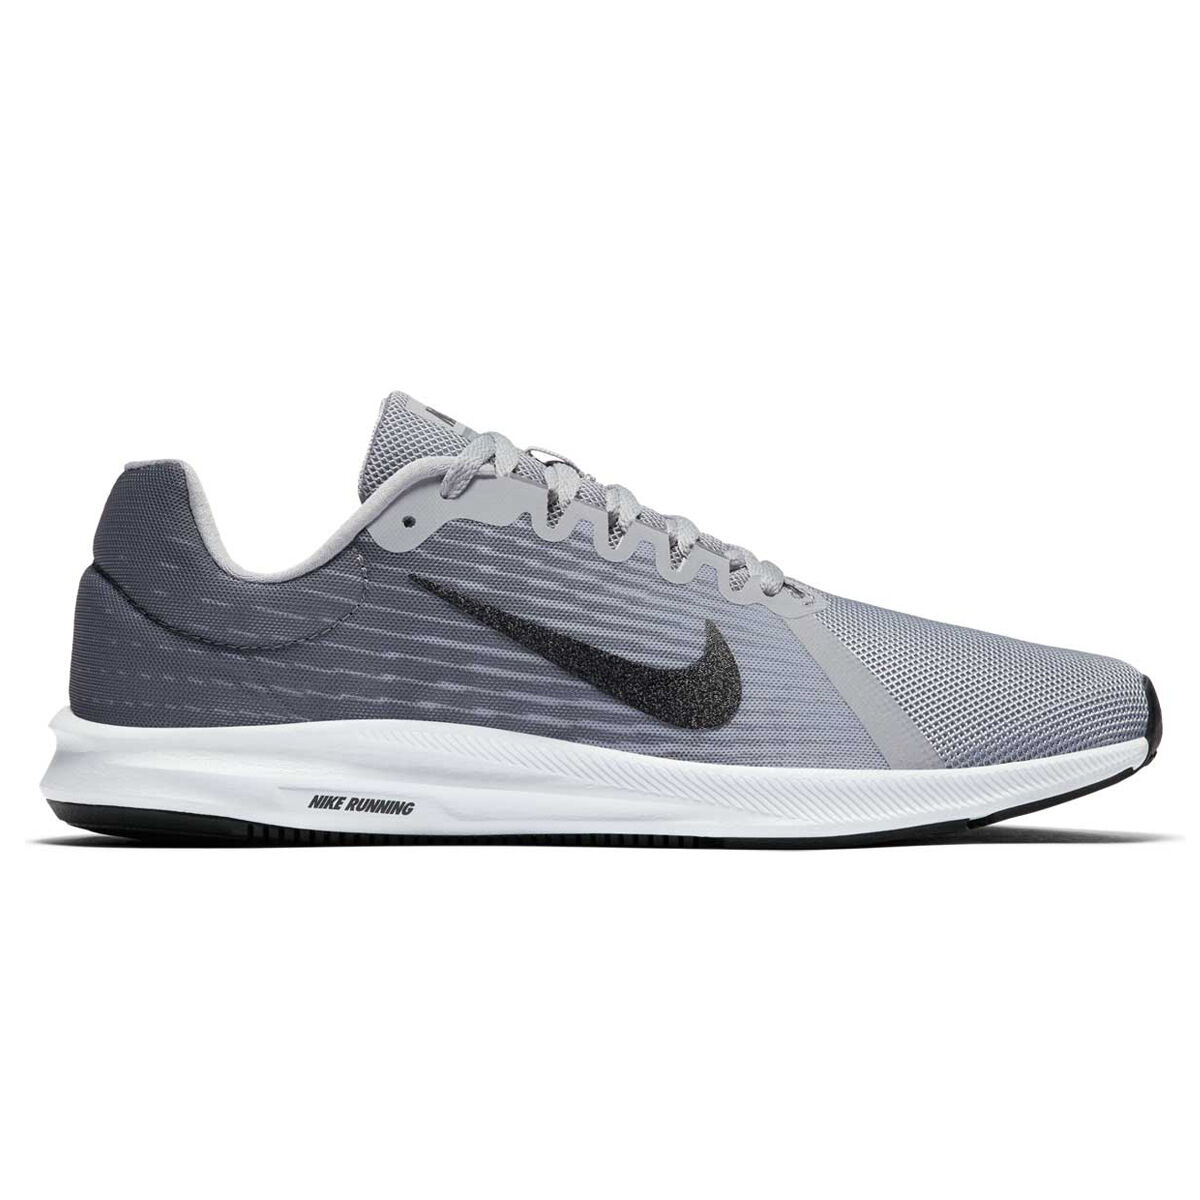 Nike Downshifter 8 Mens Running Shoes Grey Black US 8.5